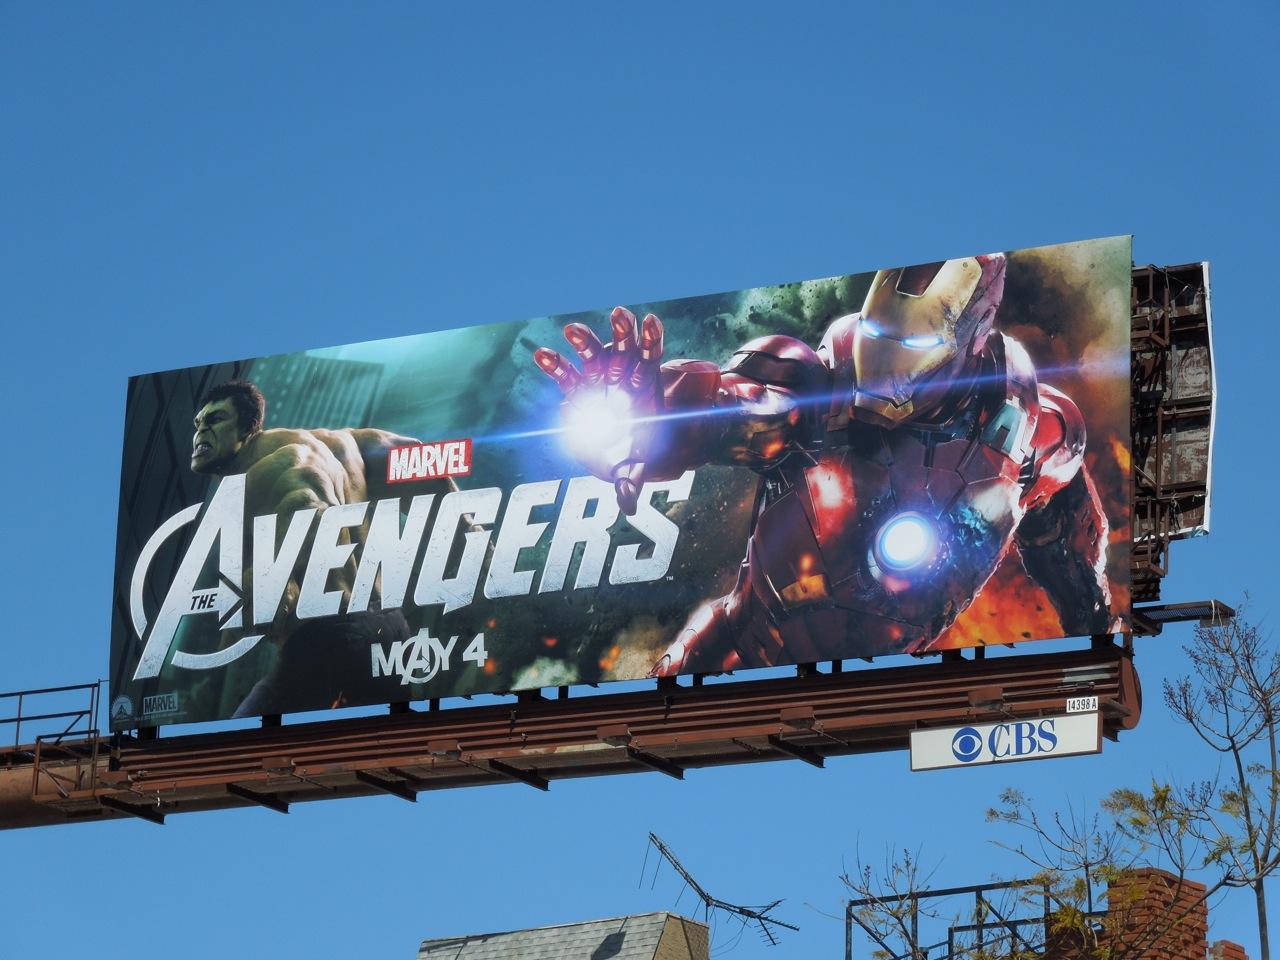 http://1.bp.blogspot.com/-xOIGo4S2GZc/T3pHgYFg2ZI/AAAAAAAAqKY/5b-DgluaDM8/s1600/avengers+ironman+billboard.jpg